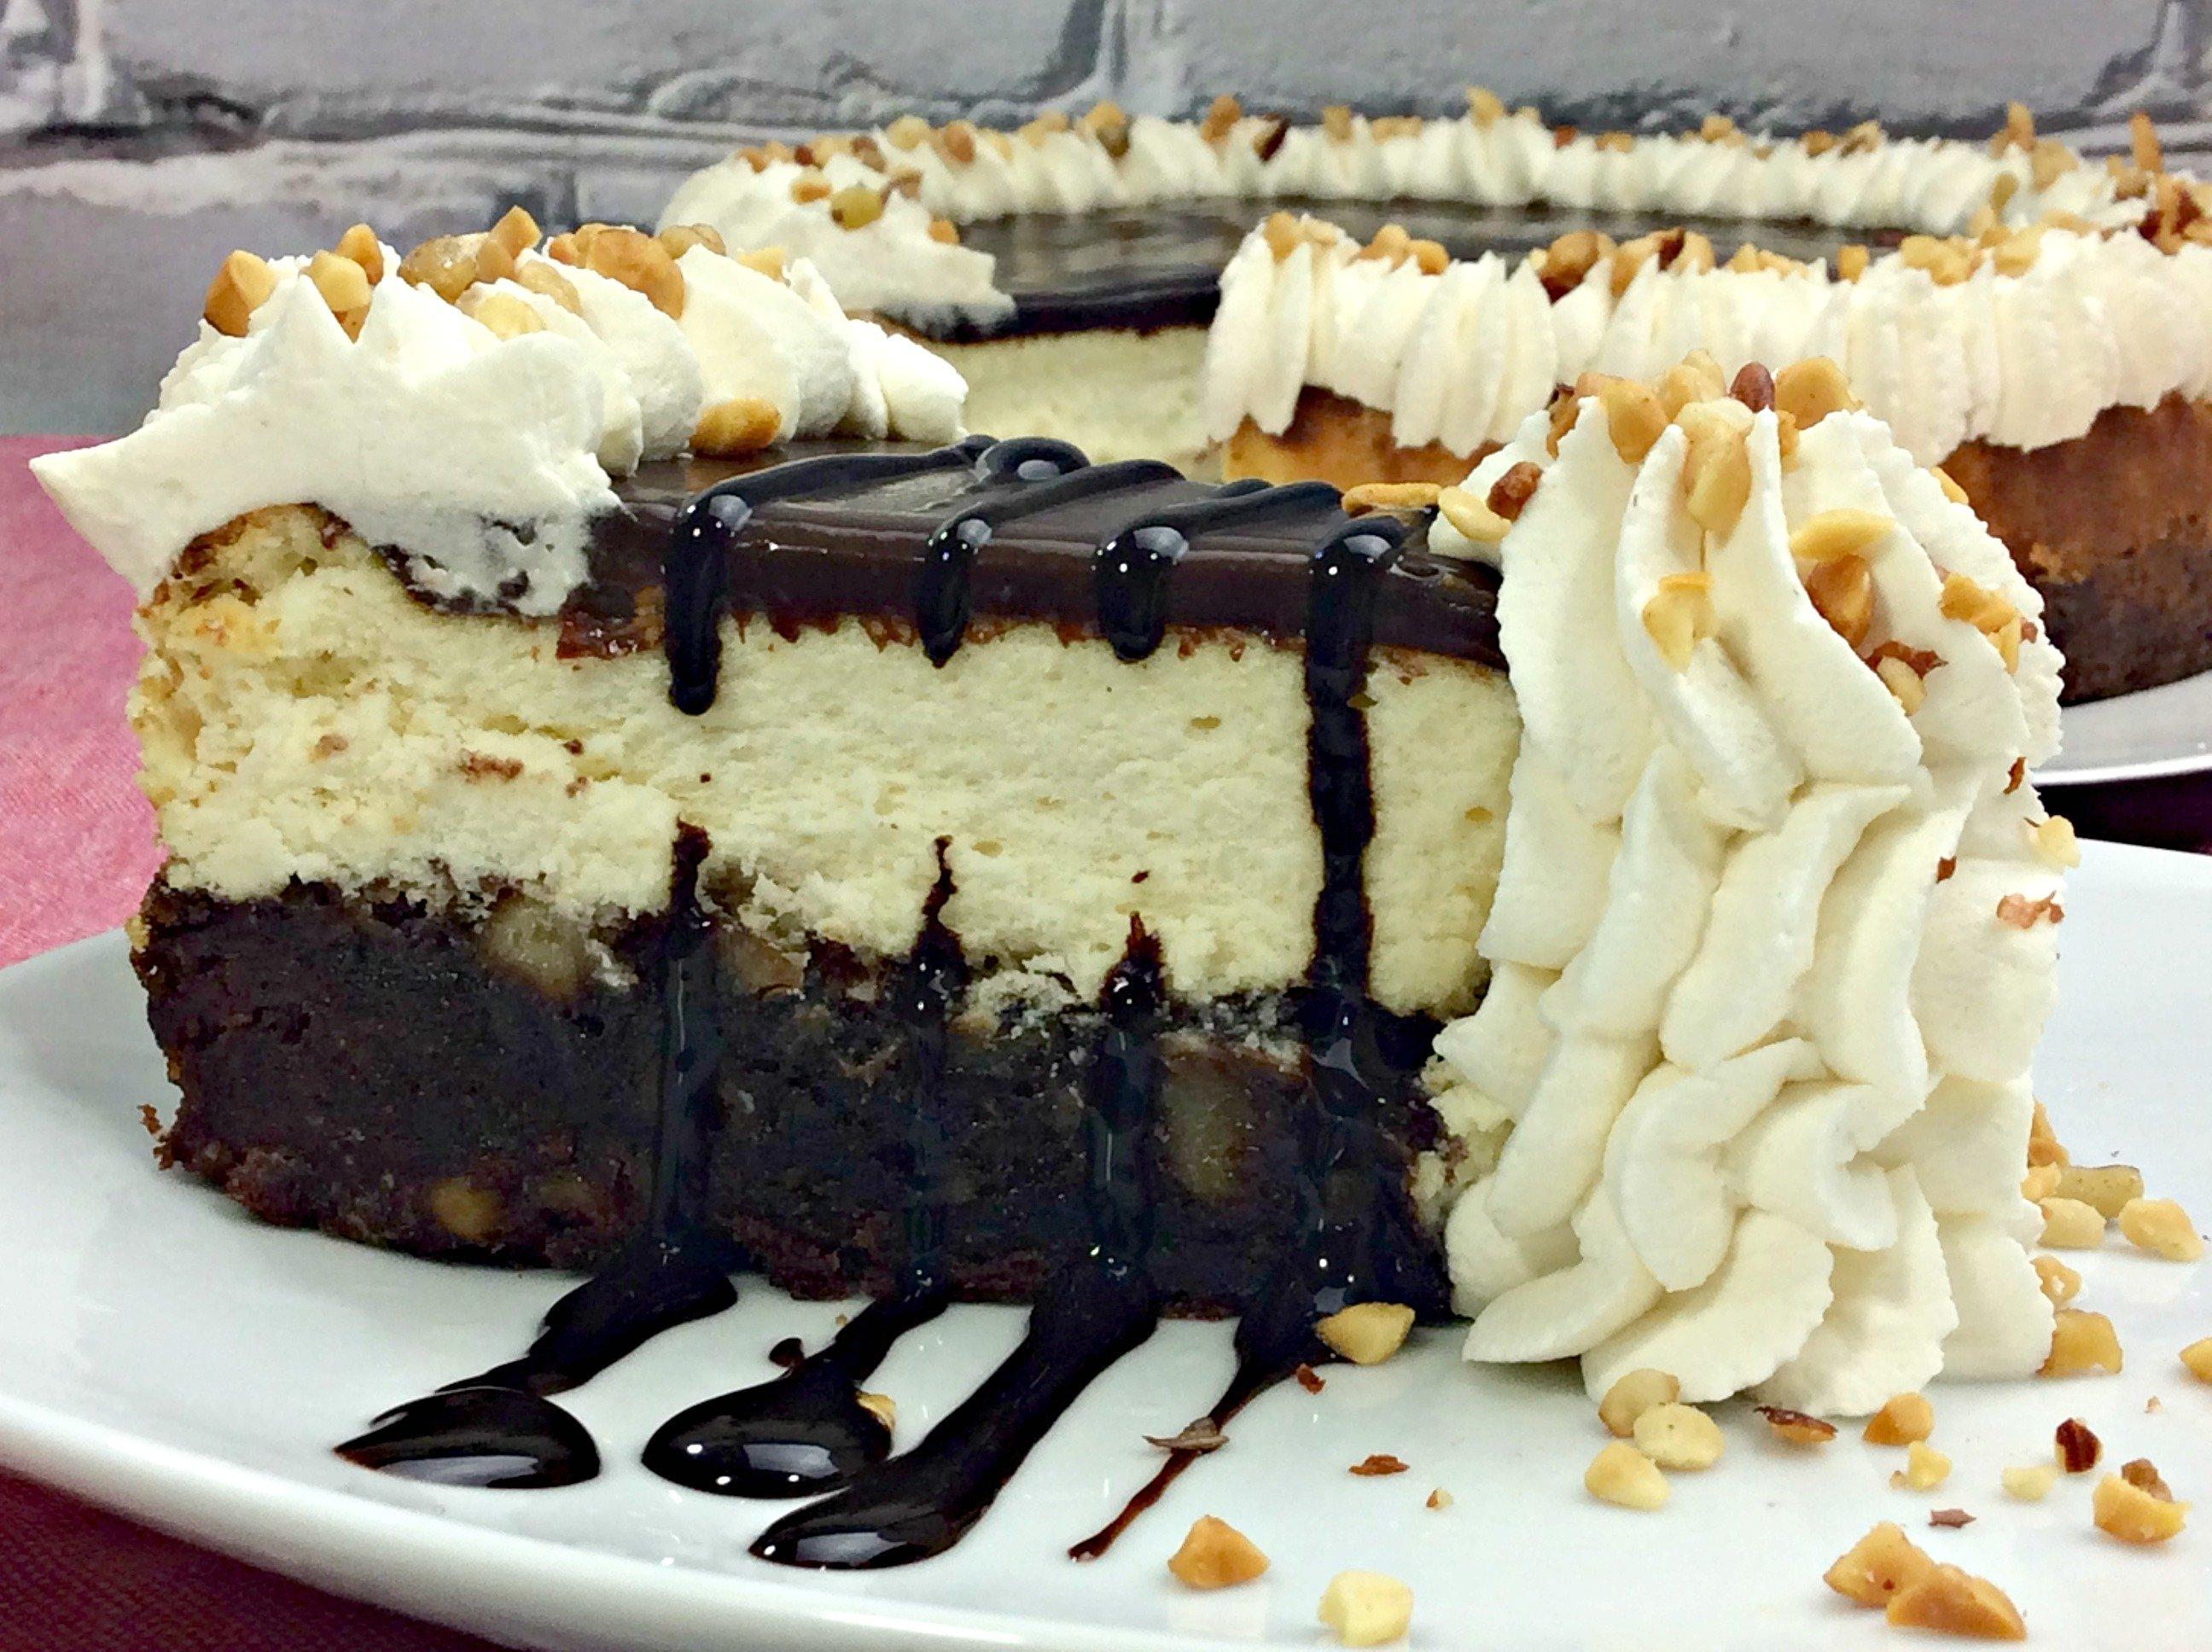 Hot Fudge Sundae Brownie Cheesecake